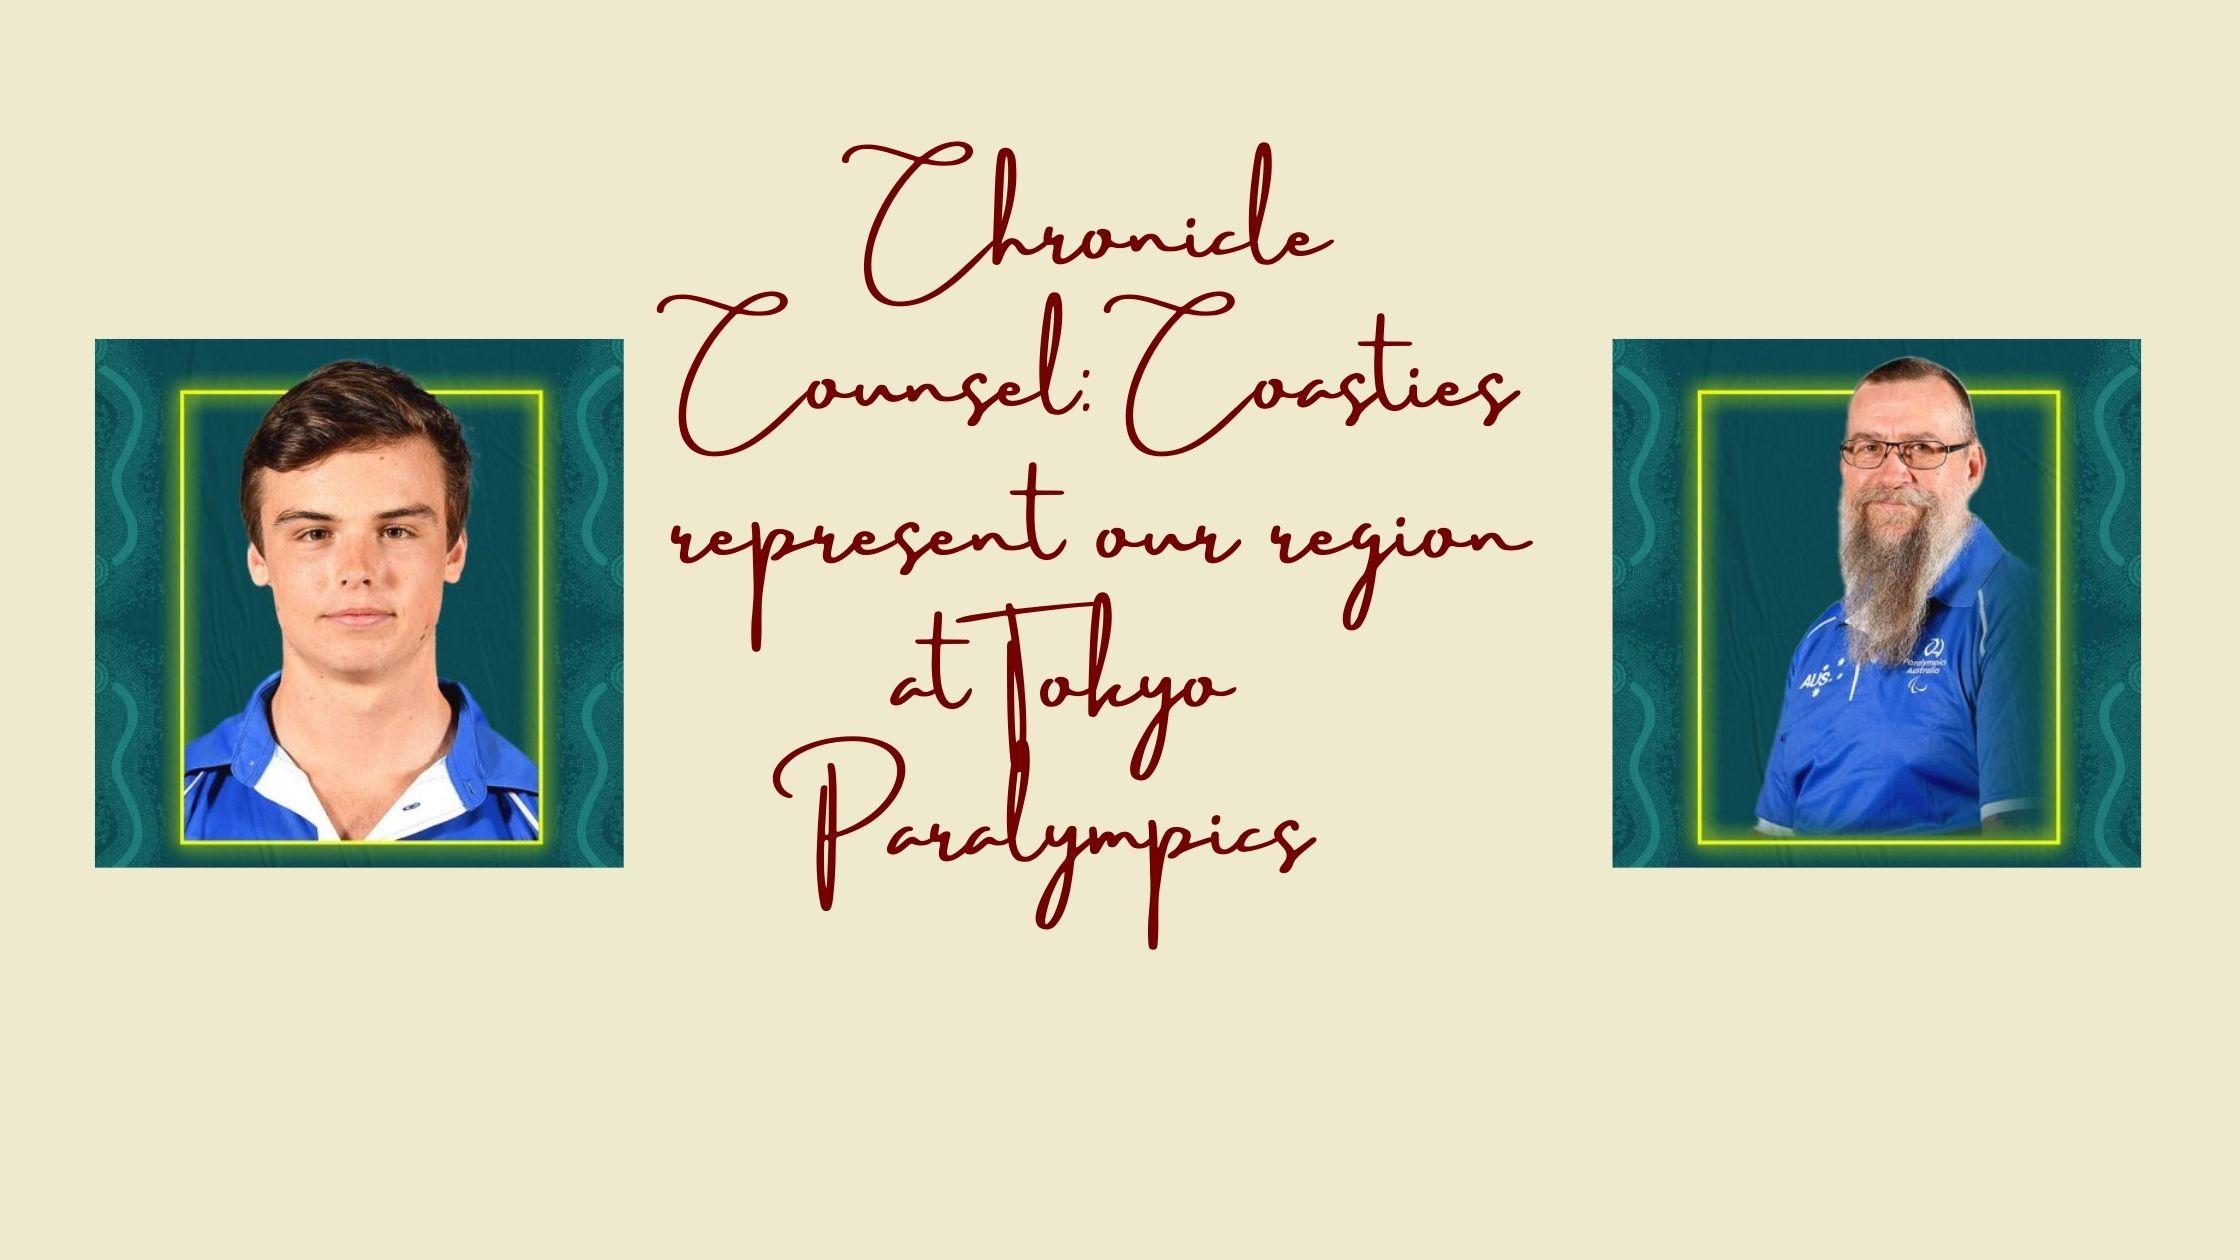 Coasties participate in Paralympic Games